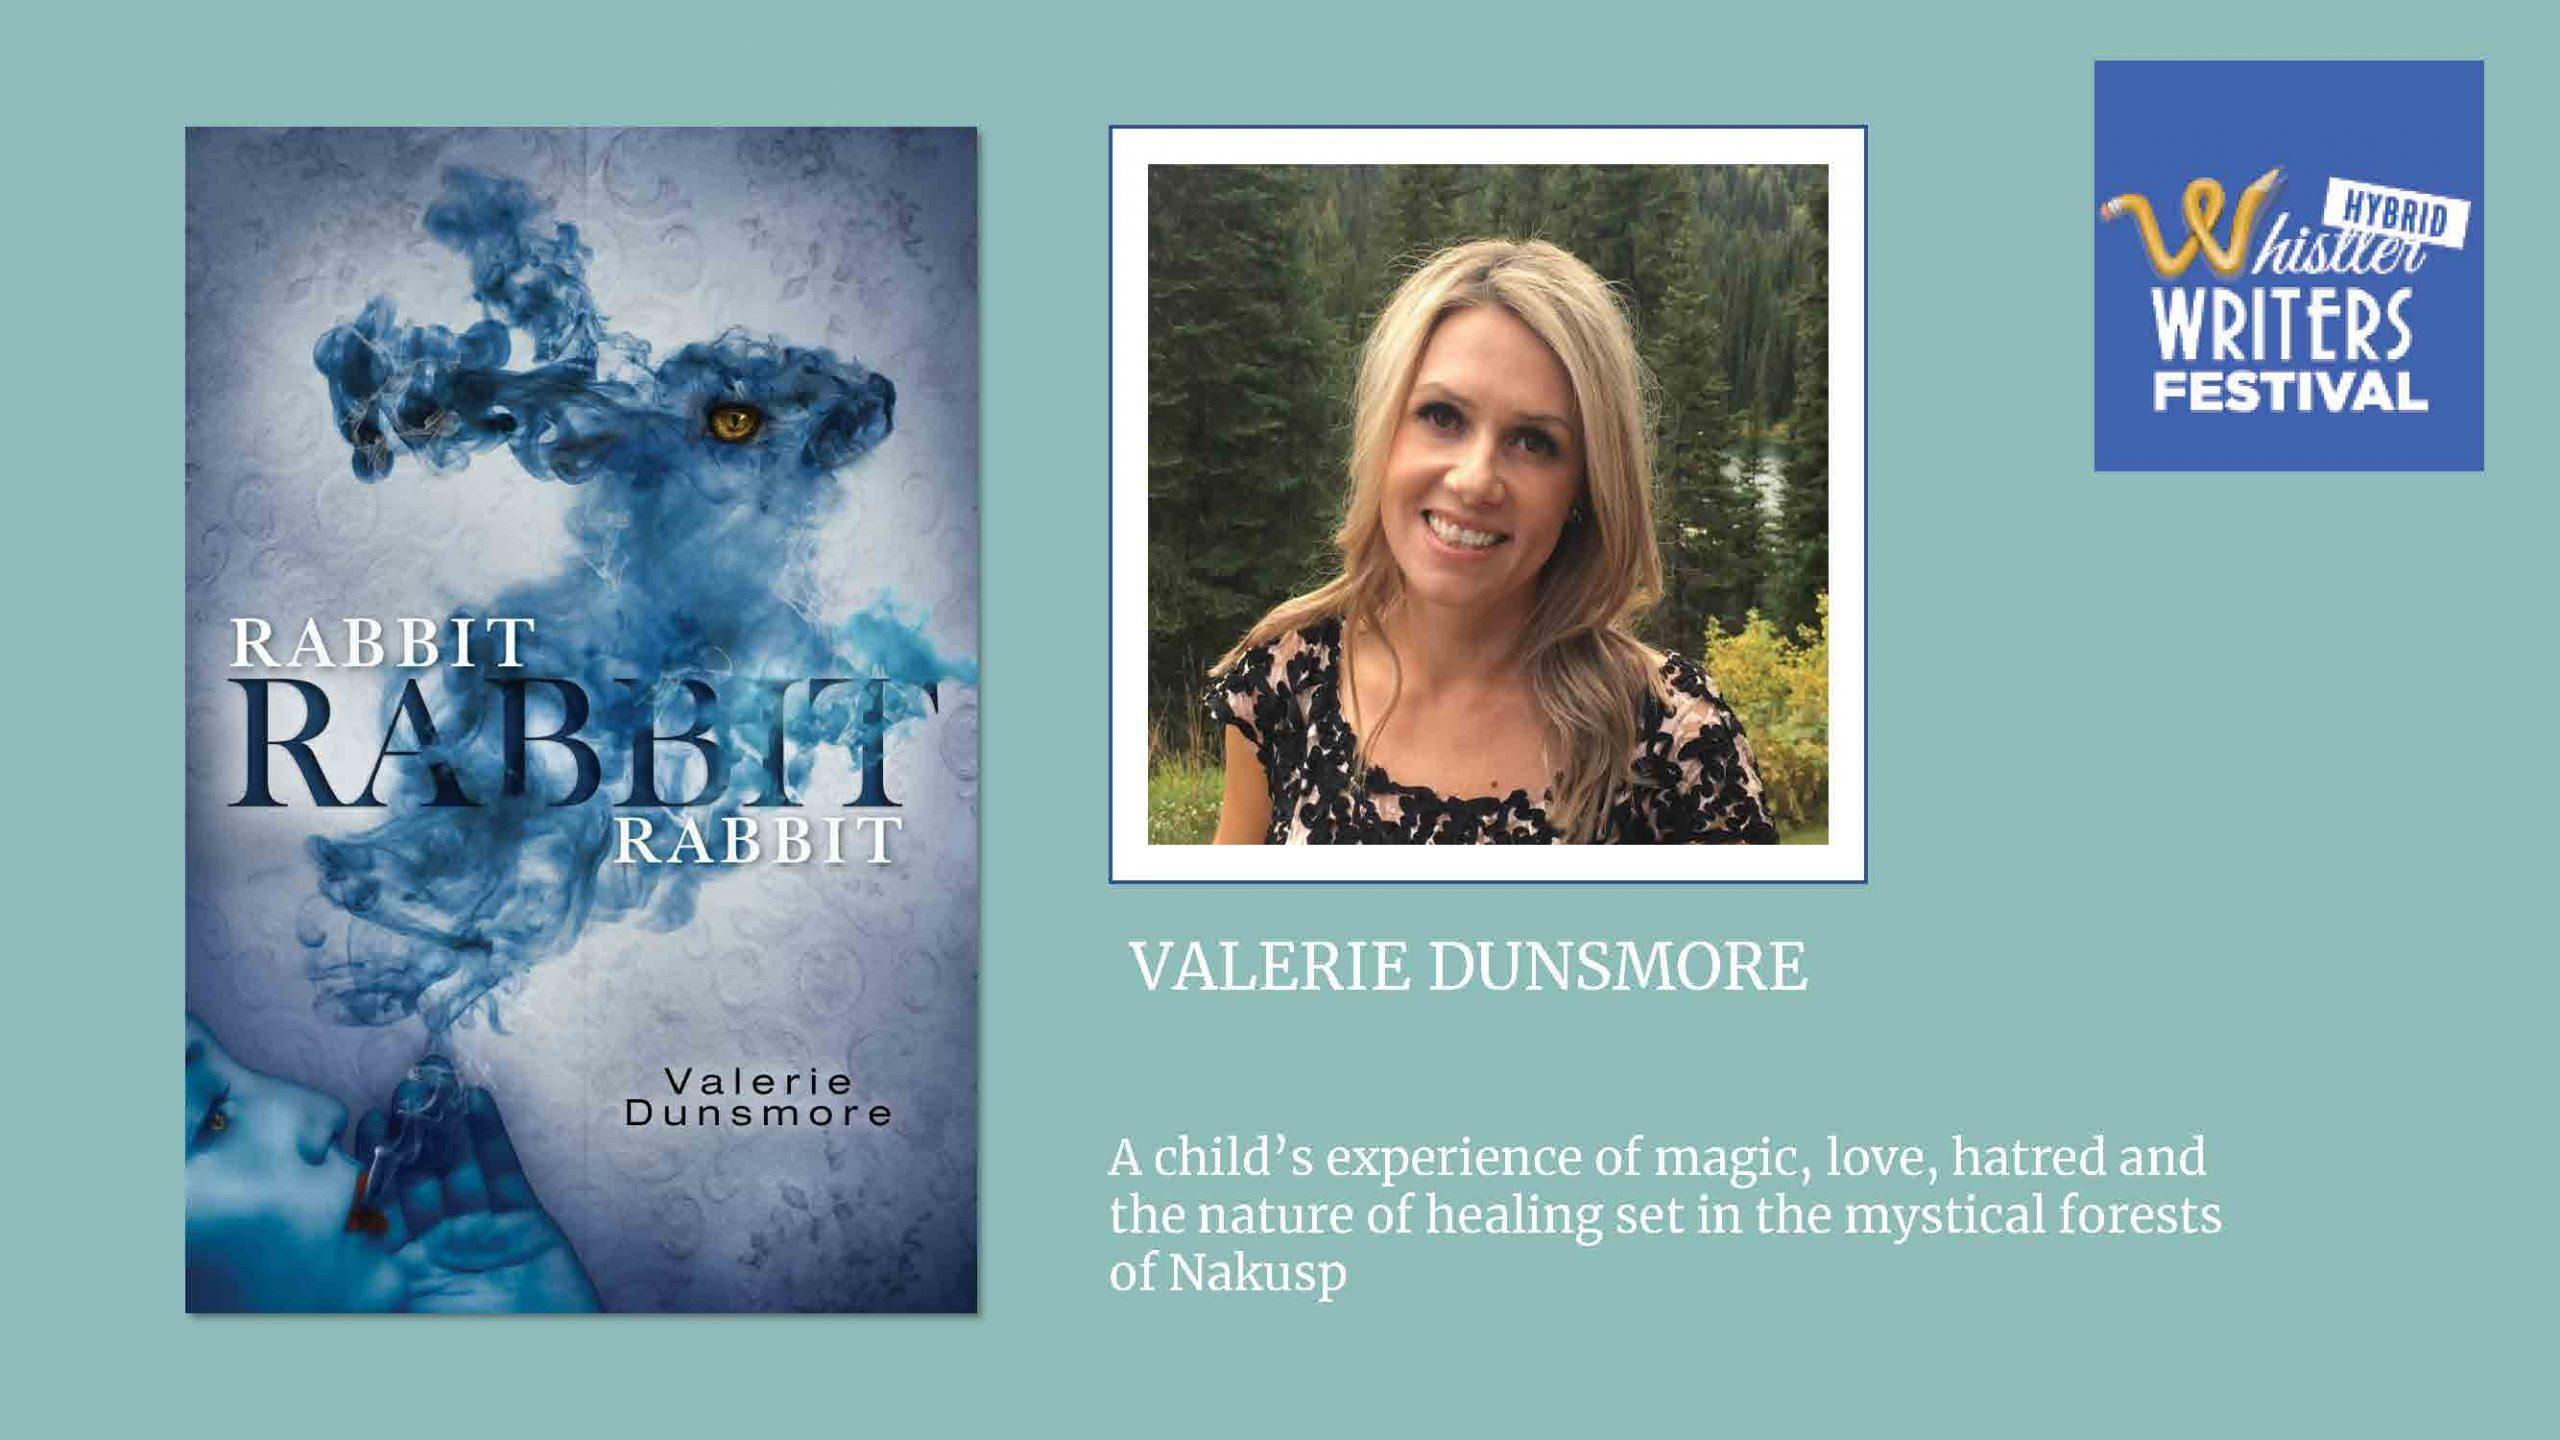 Valerie-dunsmore-rabbit-rabbit-rabbit